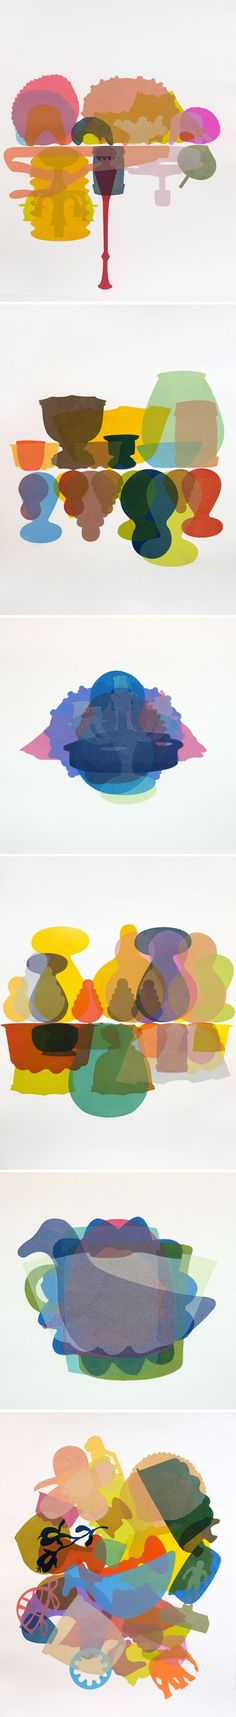 monoprints by laura berman